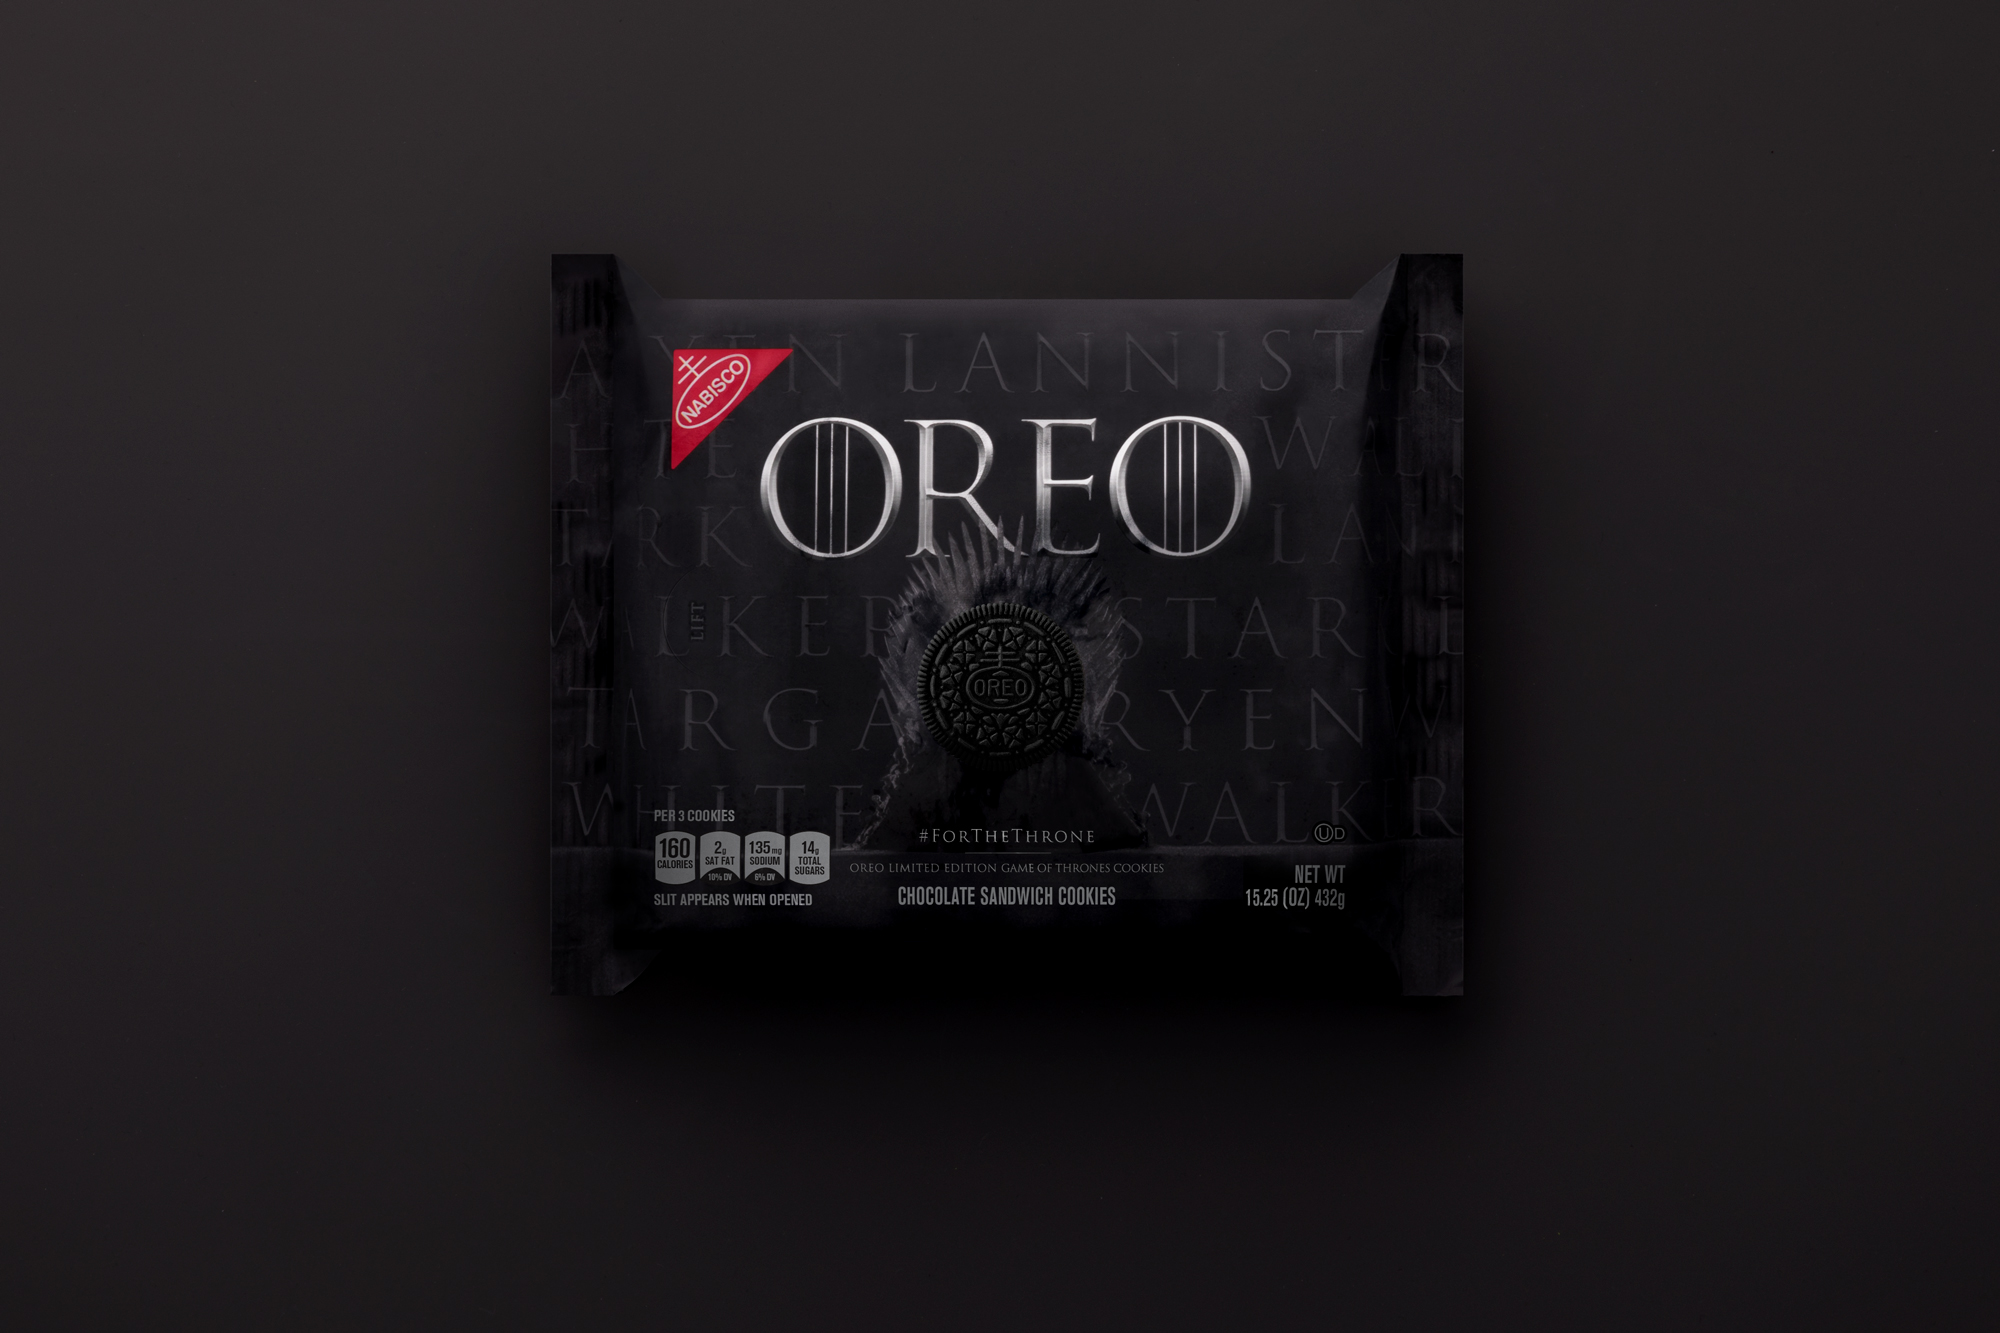 Game of Thrones OREO packaging